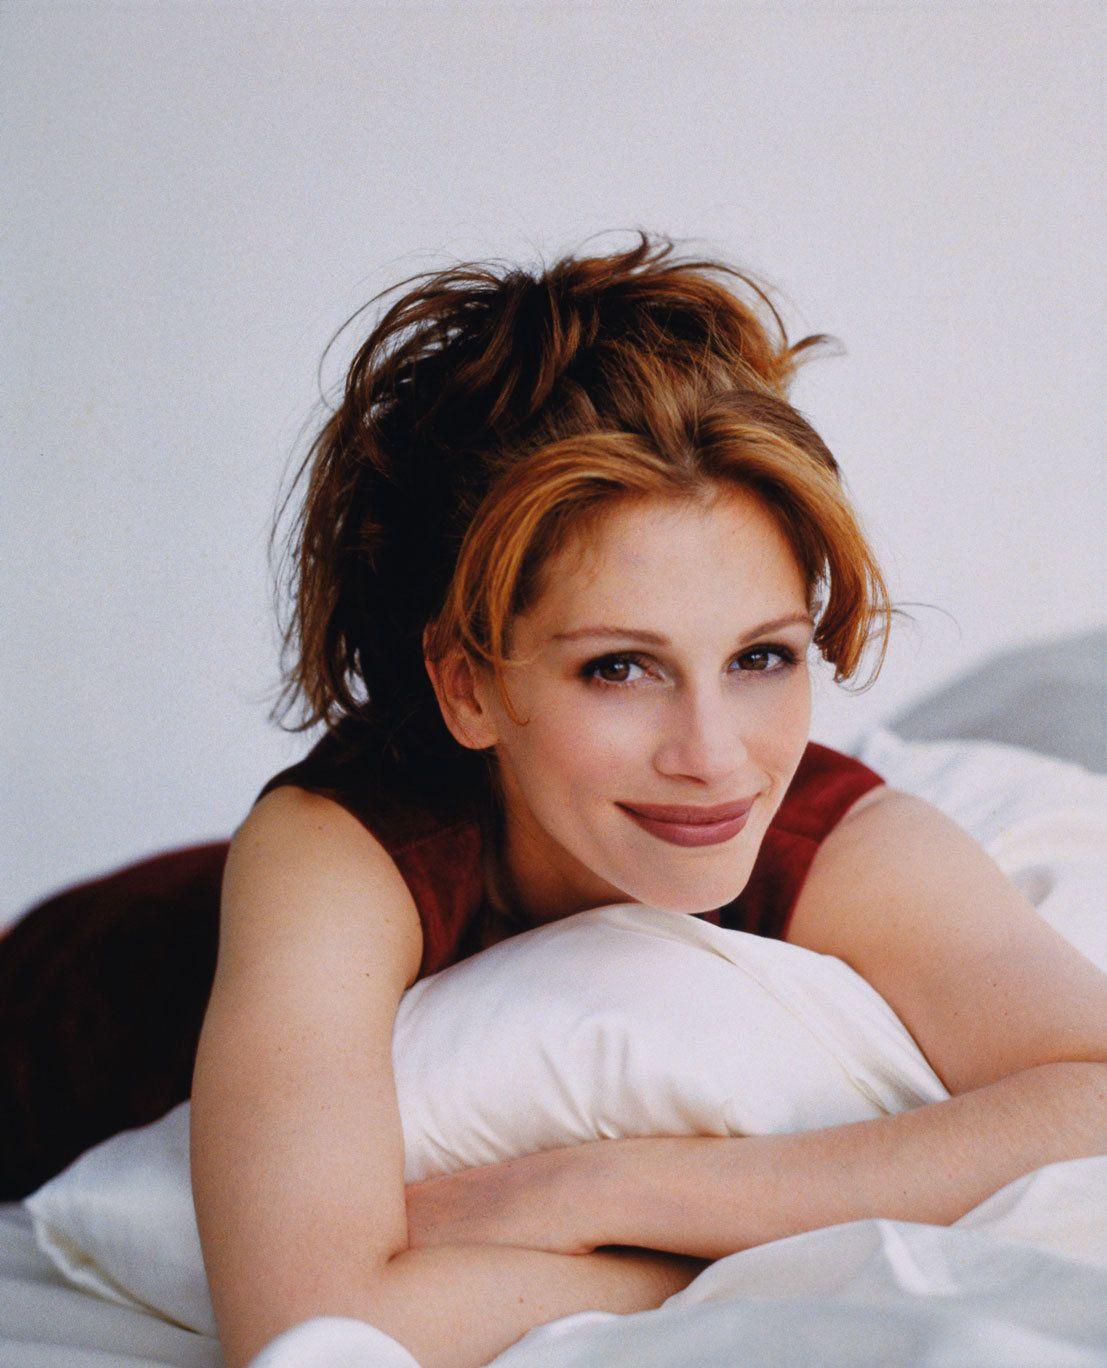 Women of the 90s — Vivica A. Fox, 1998 in 2020 Julia